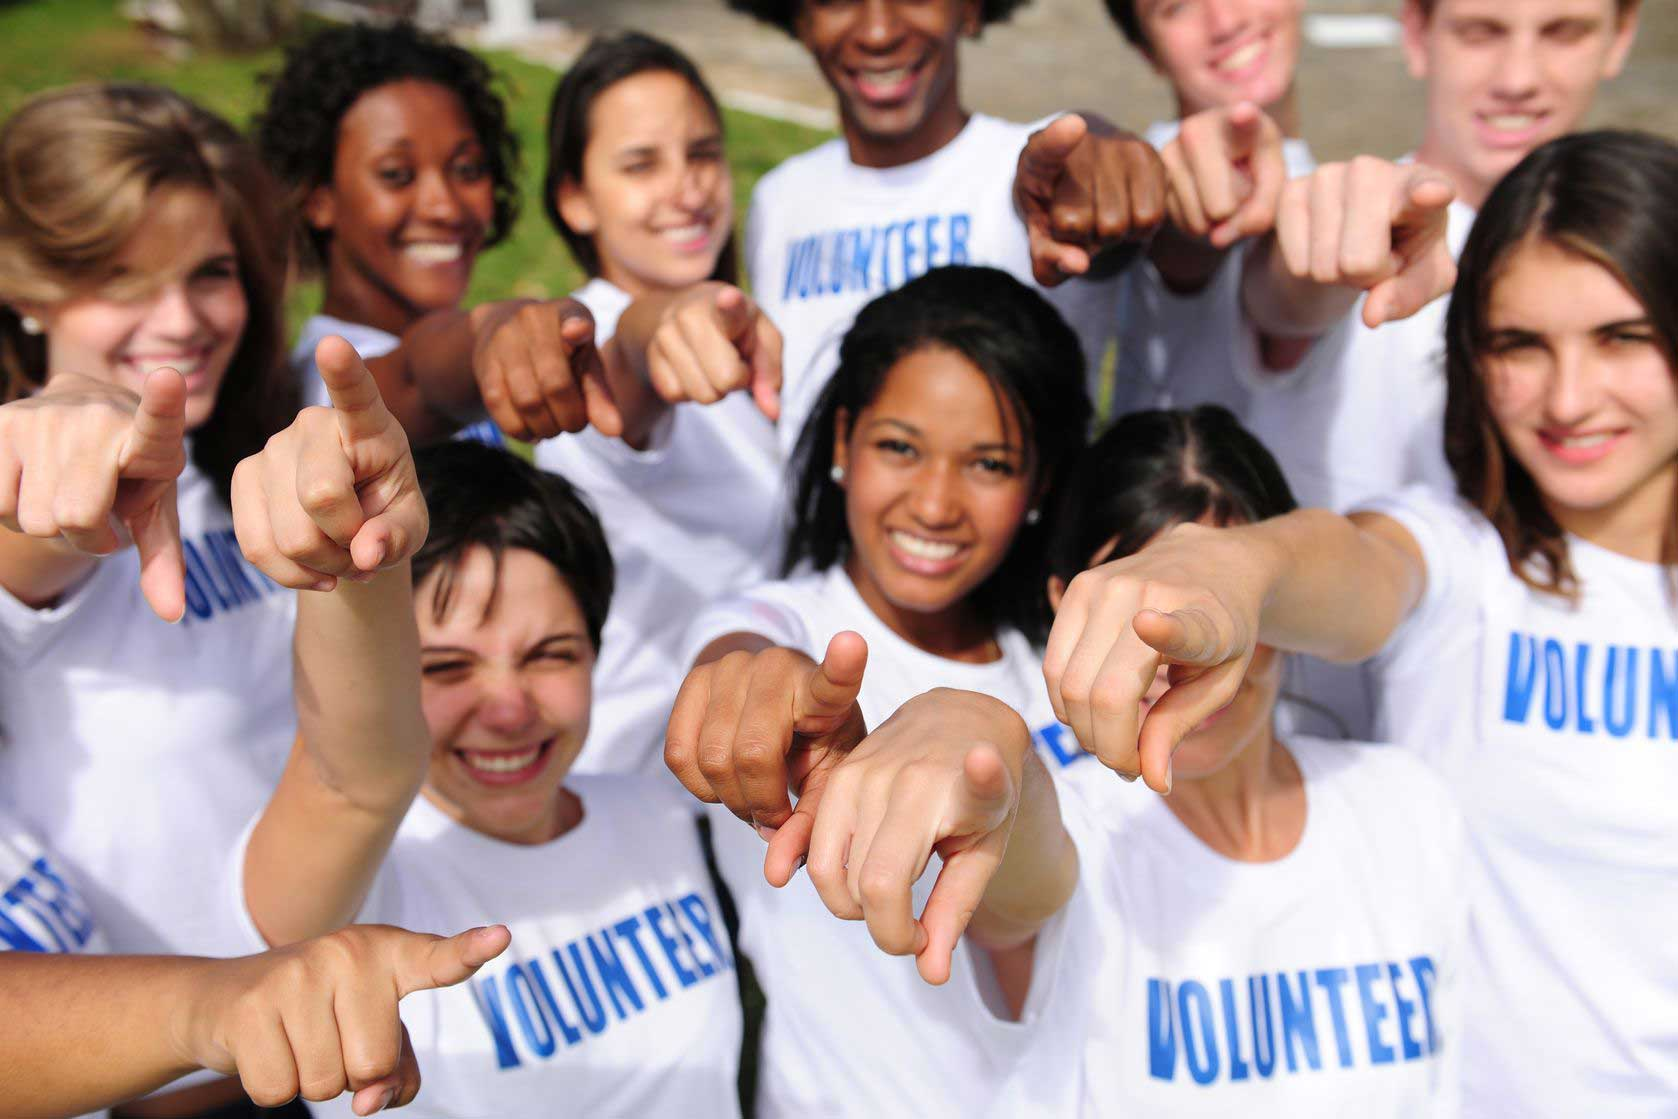 Днем, волонтерство картинки фото